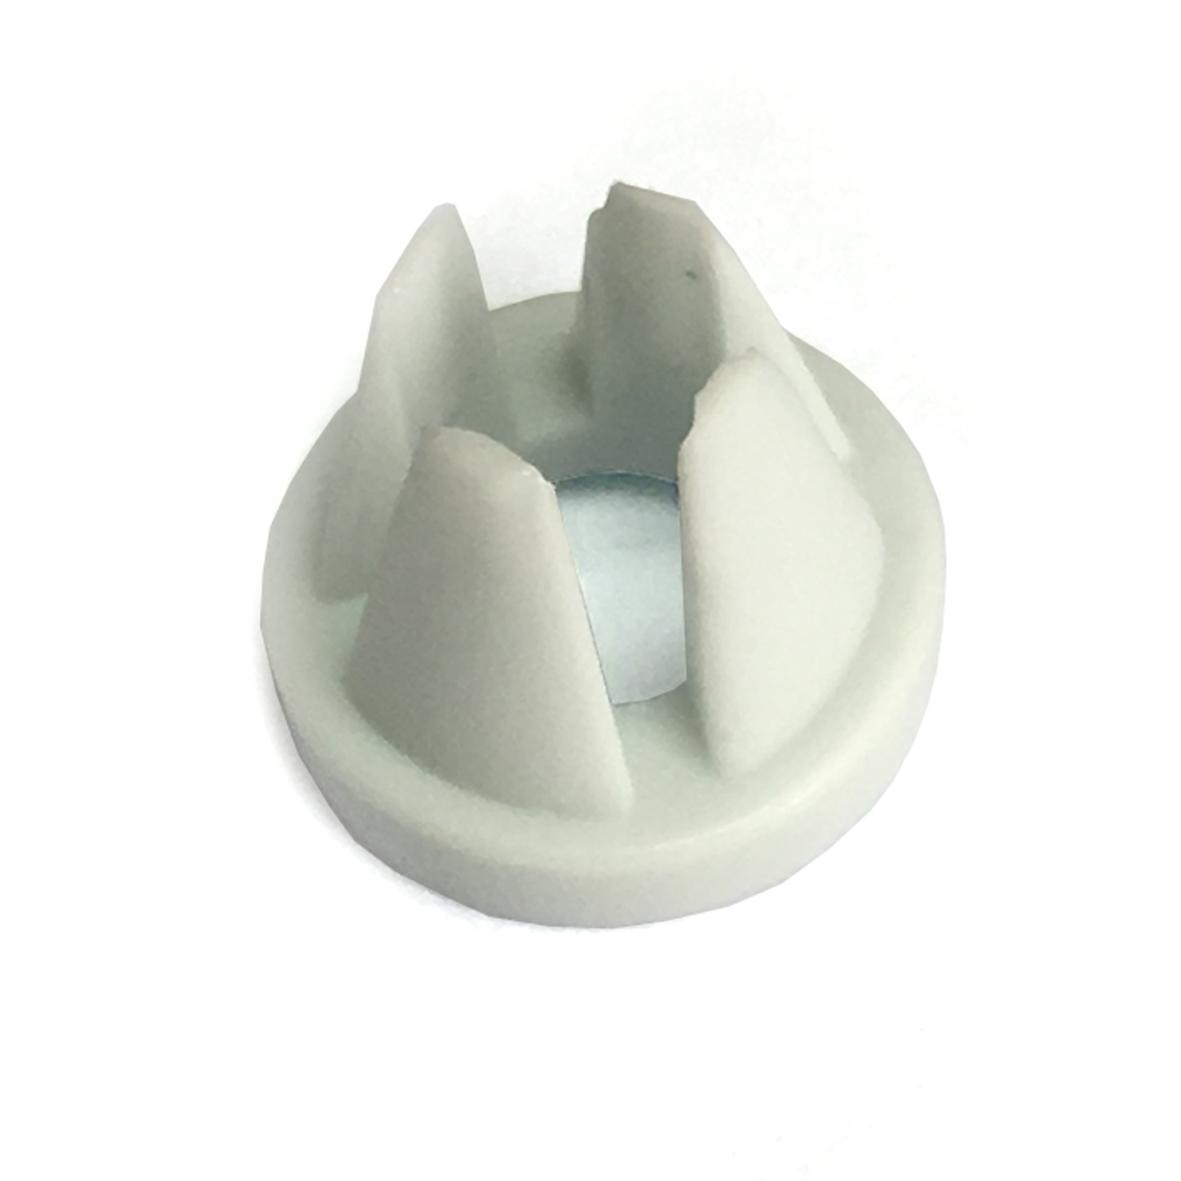 Bernina Spool Retaining Disc (Small)